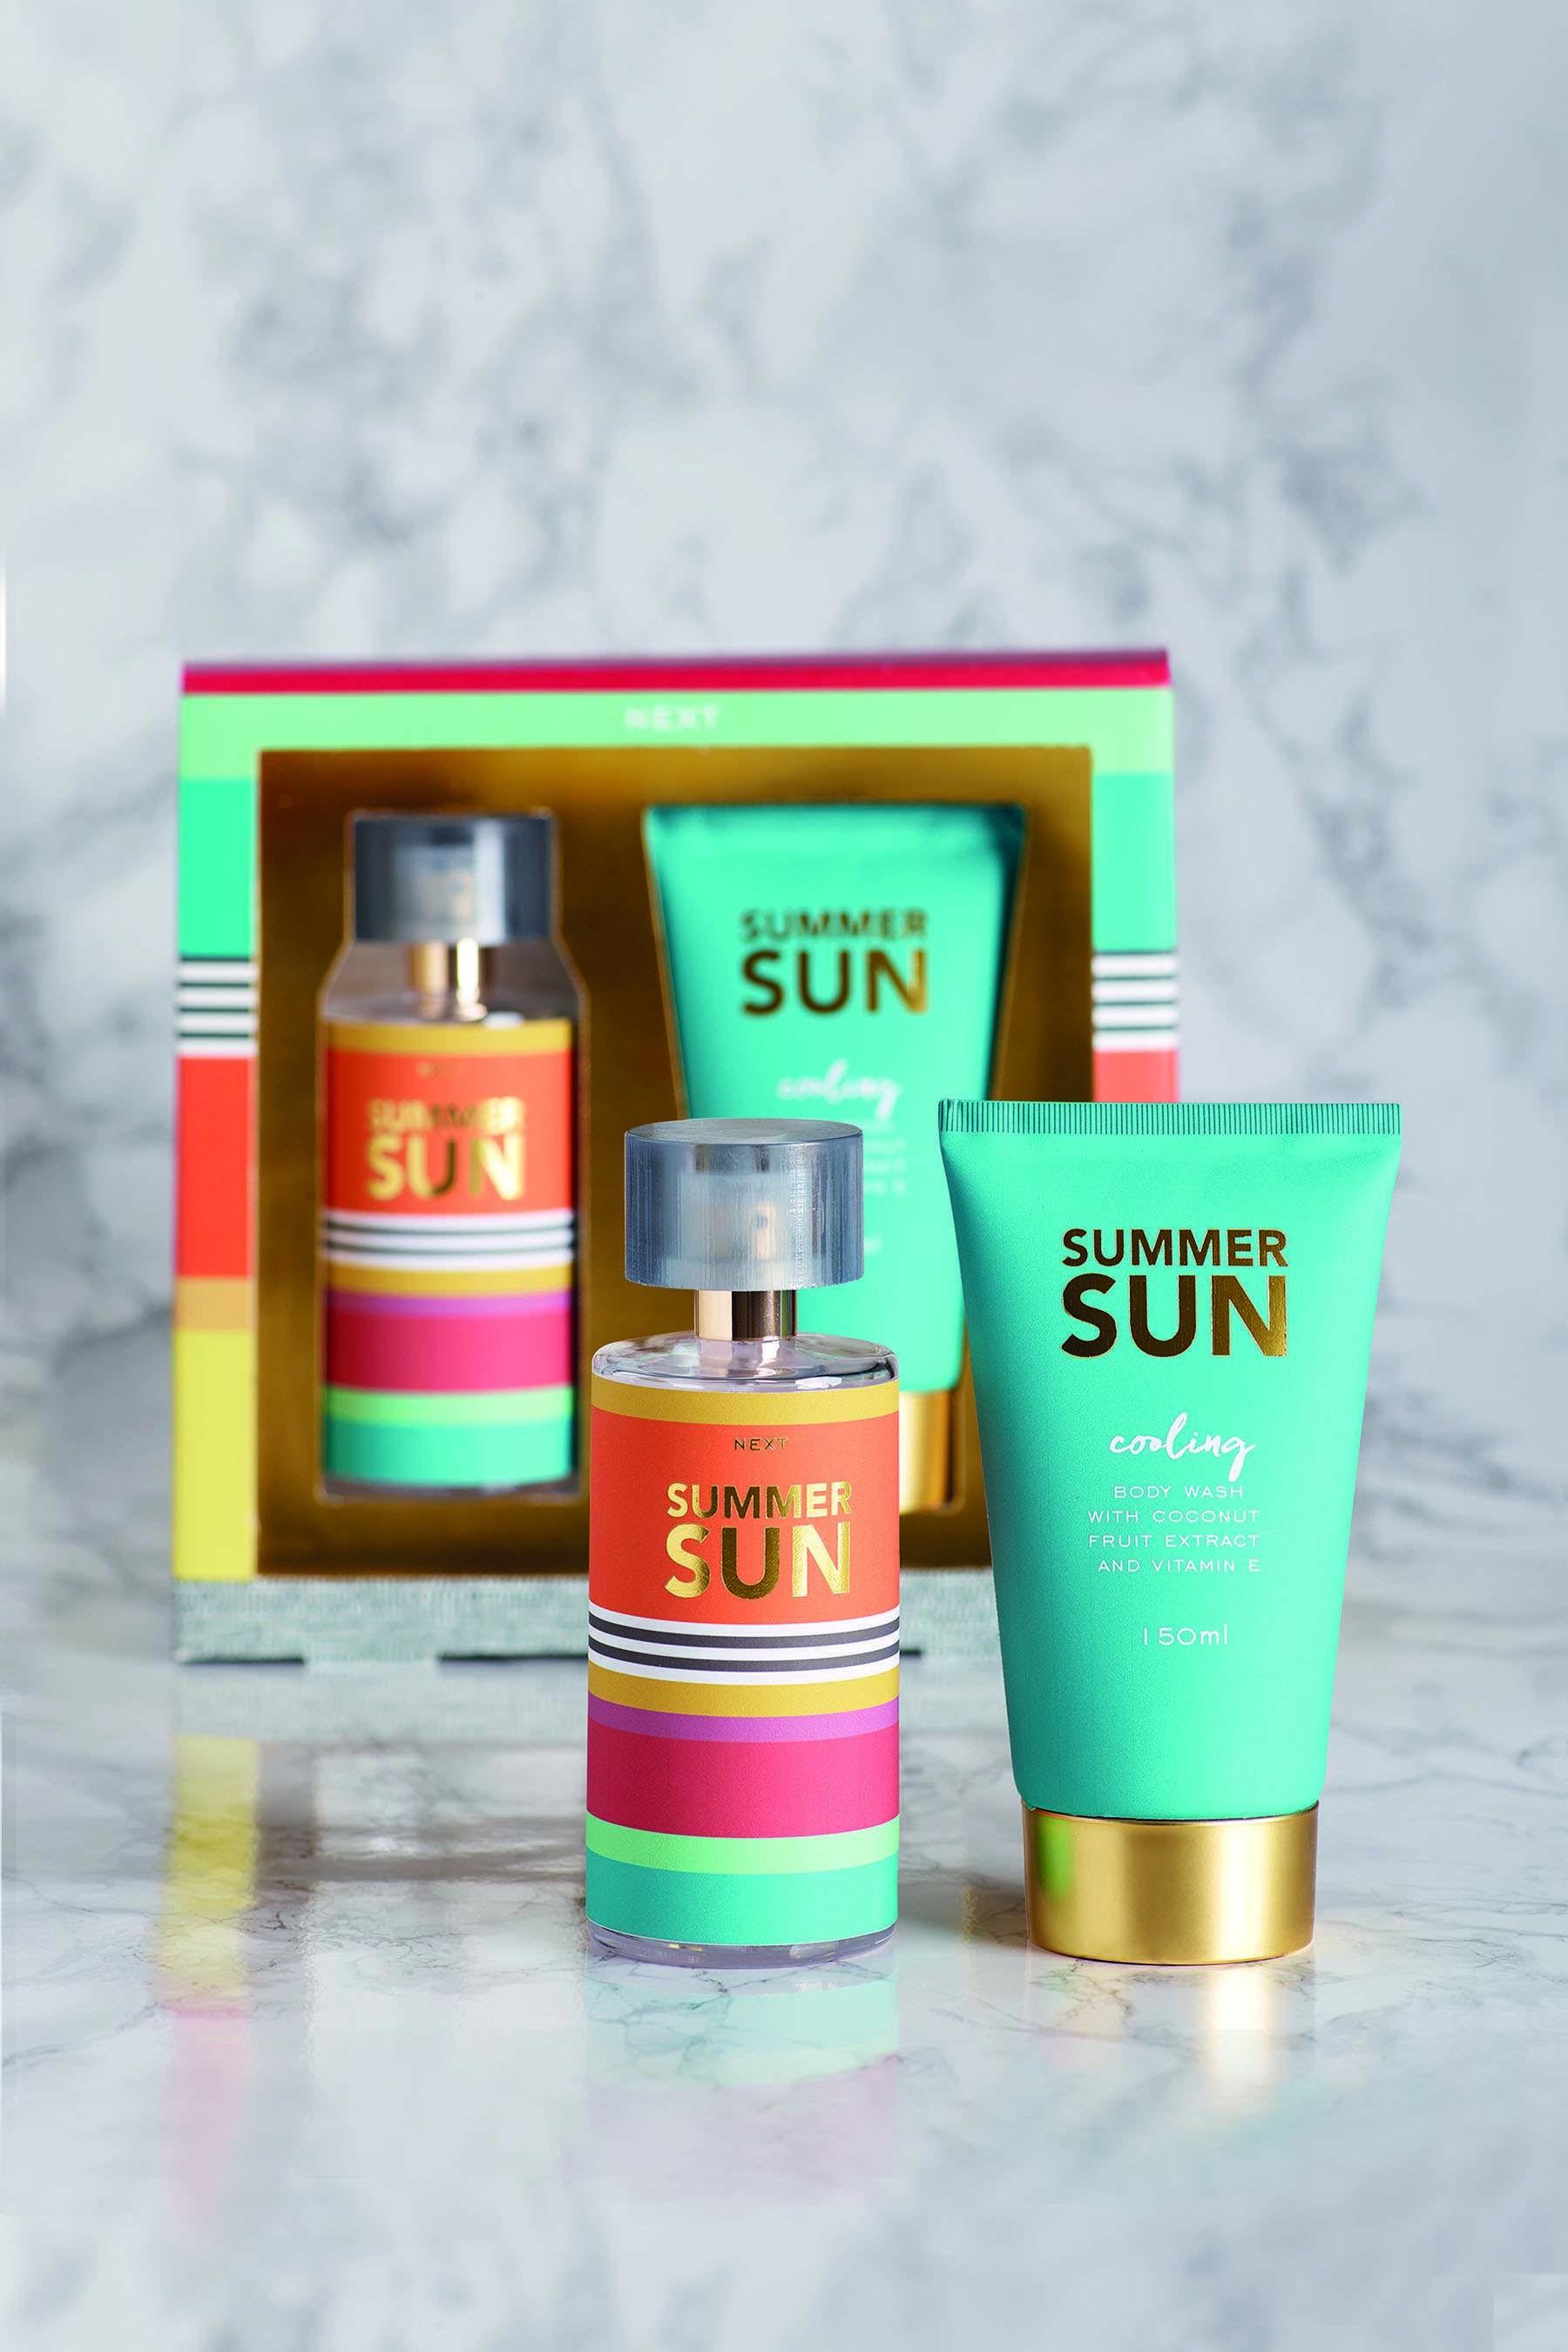 Summer Sun Fragrance Gift Set from the Next UK online shop